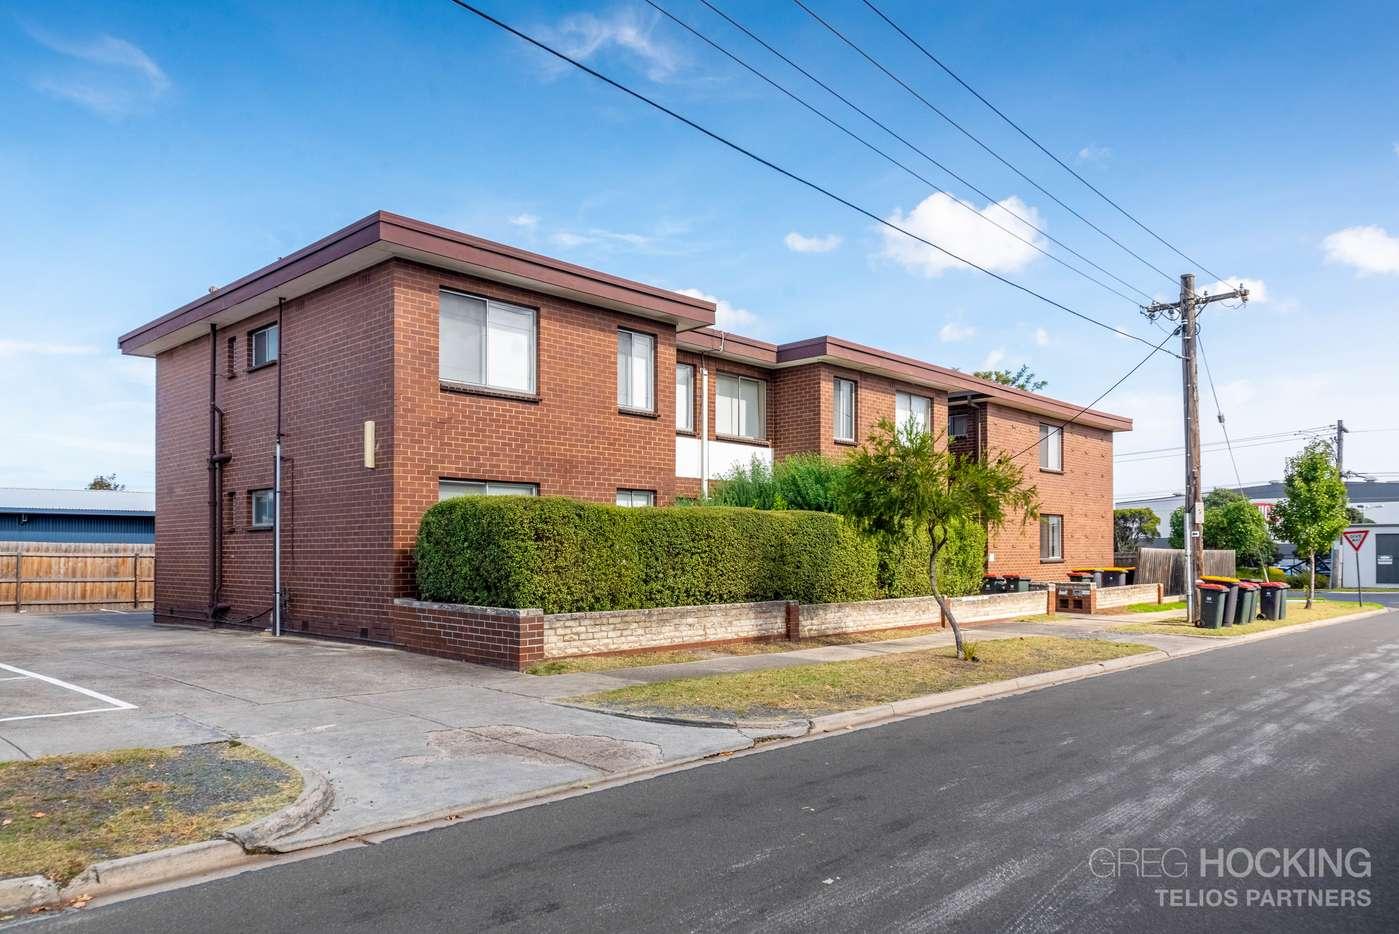 Main view of Homely apartment listing, 1/264 Huntingdale Road, Huntingdale, VIC 3166